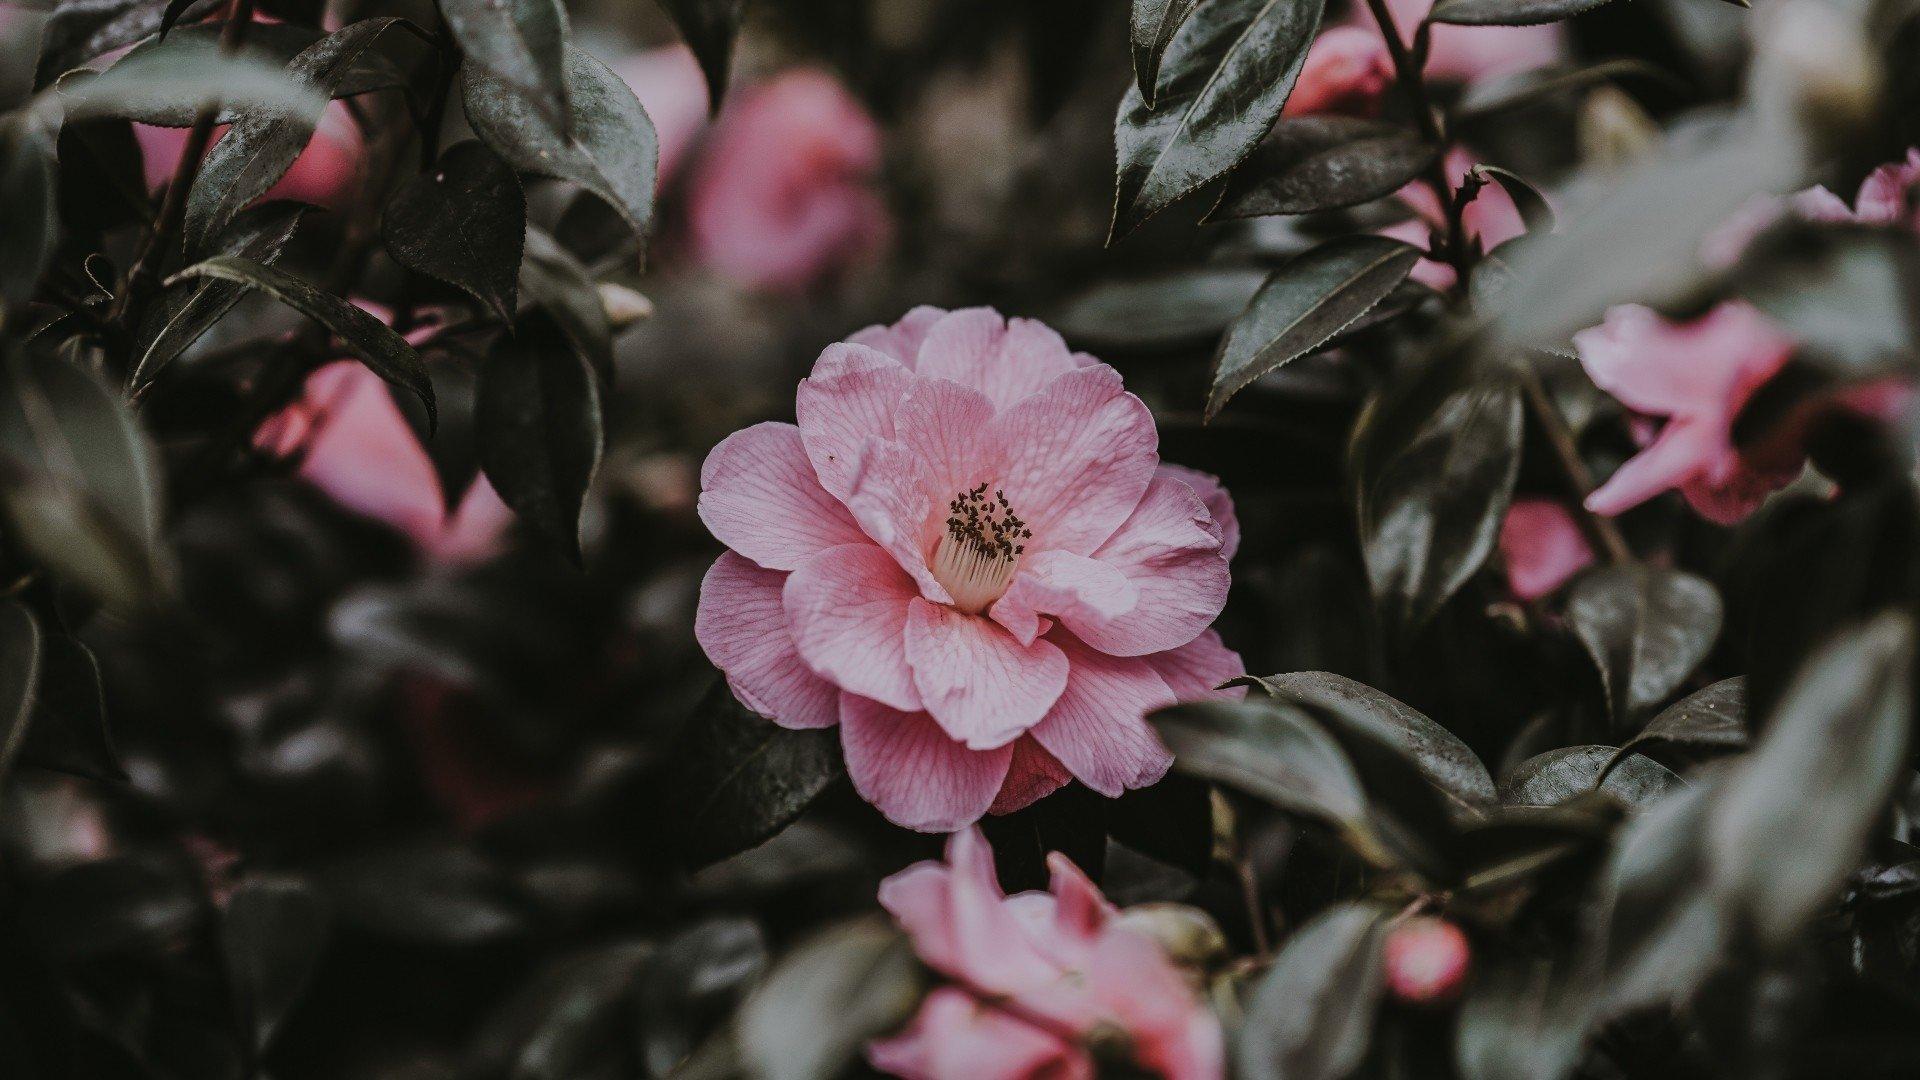 Aesthetic Rose Wallpaper Free Download